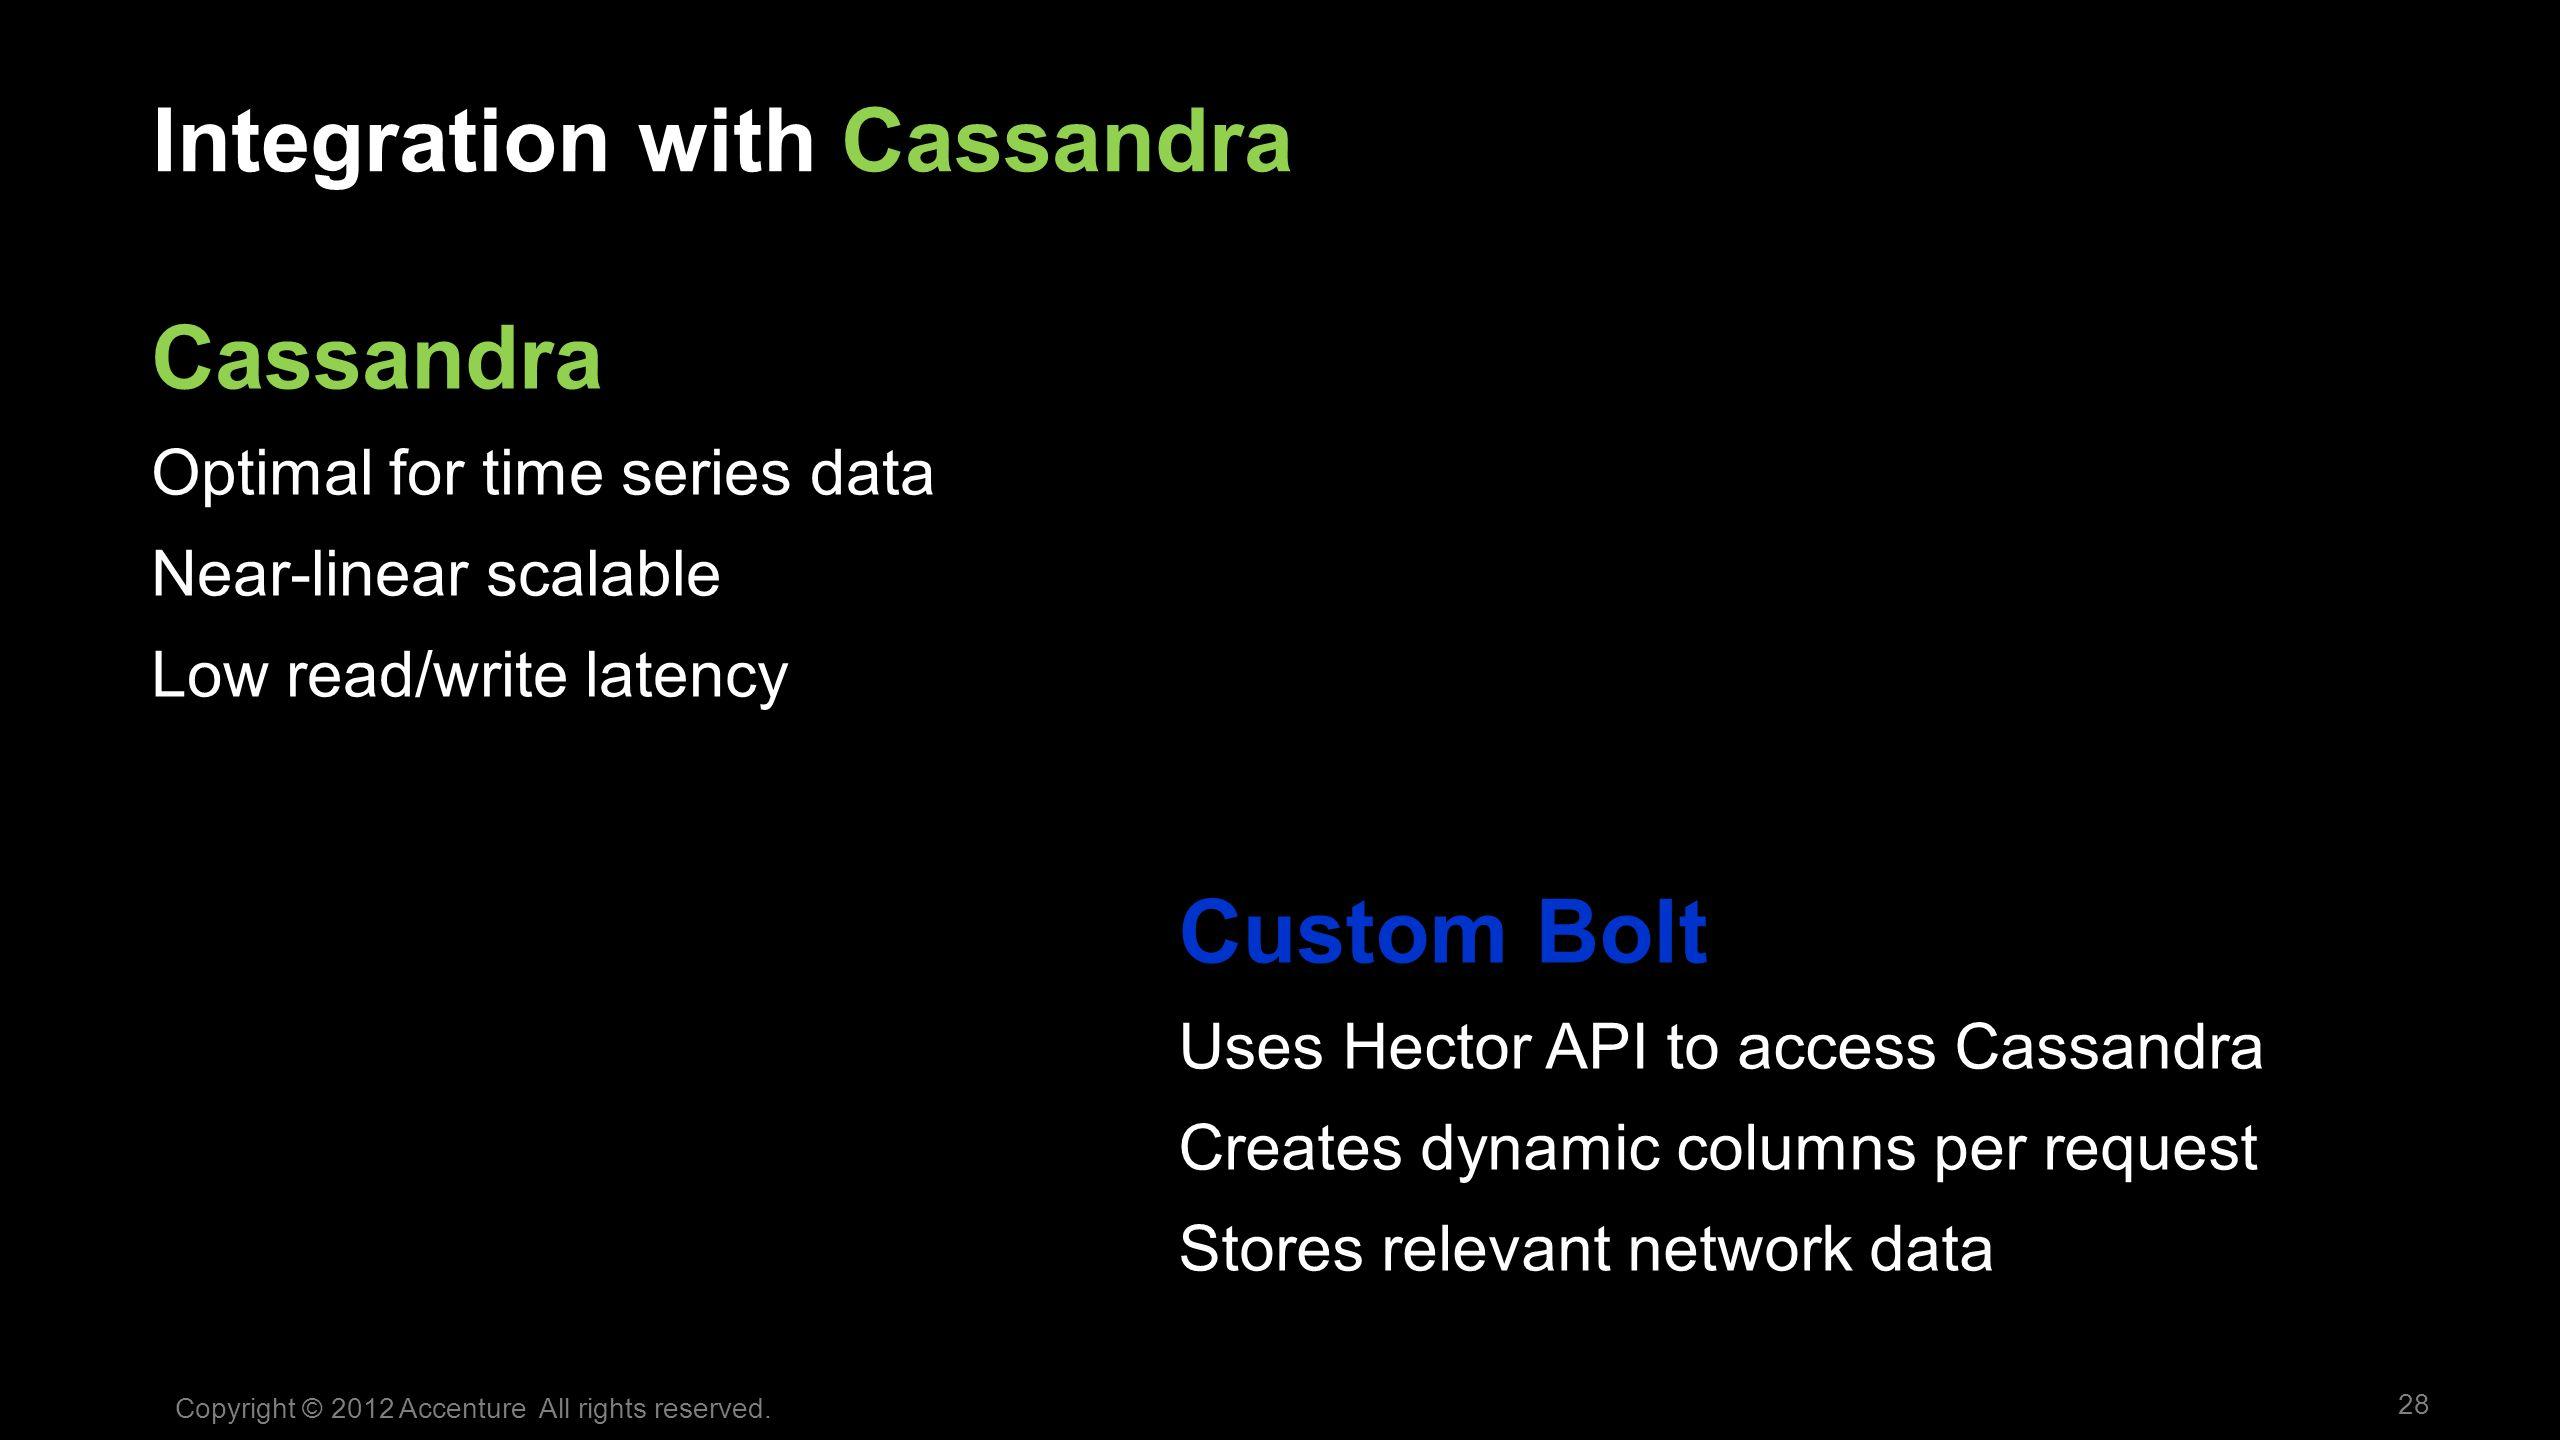 Integration with Cassandra